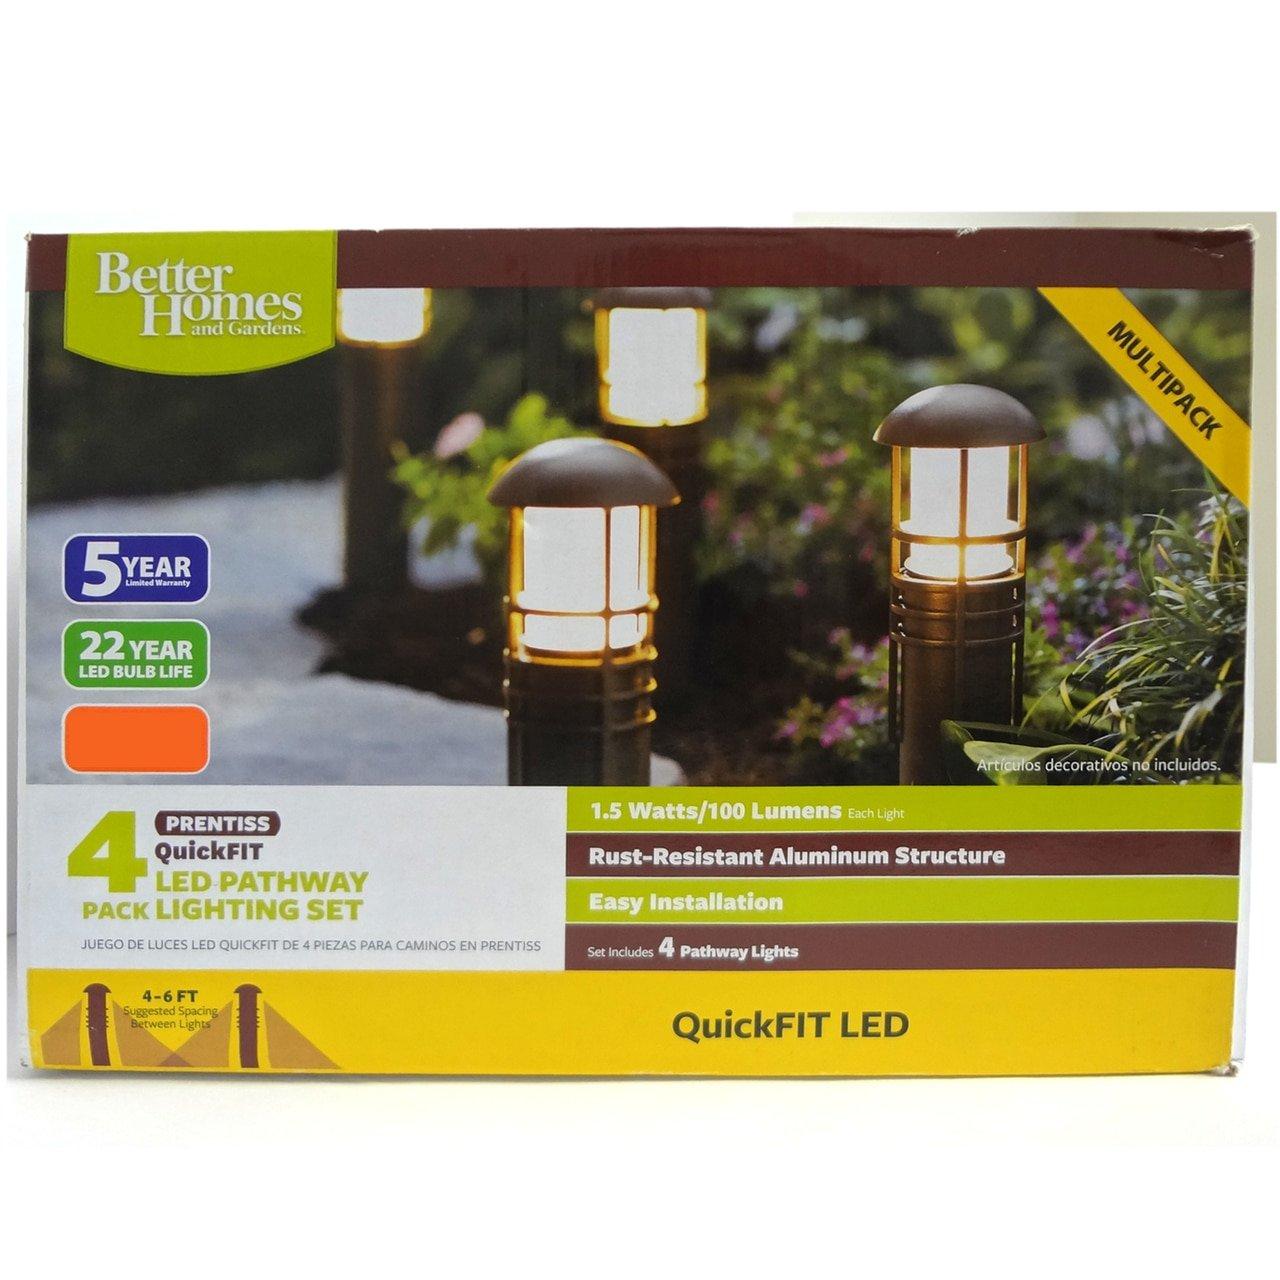 4-Piece QuickFIT LED Bollard Better Homes and Gardens BH17-092-099-28